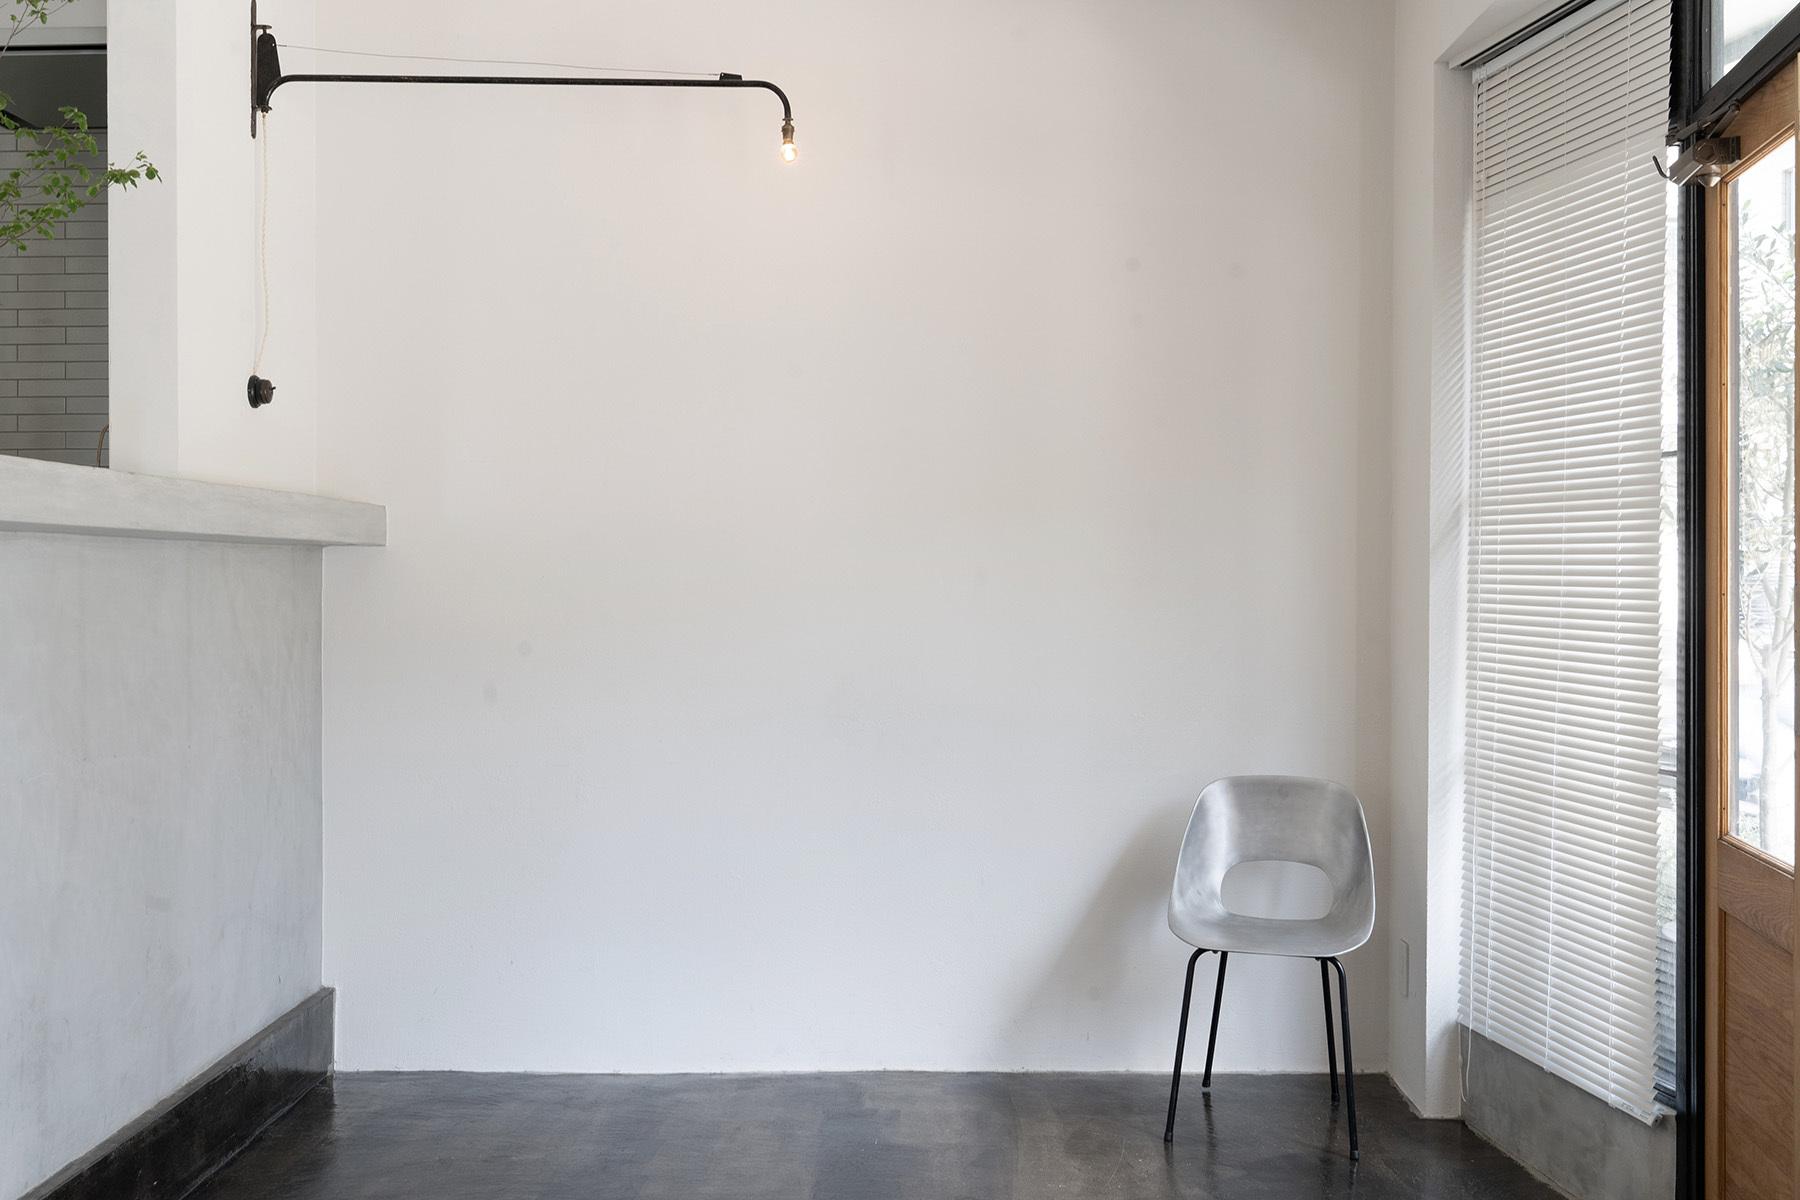 Laiton galleyspace & studio (レトン)什器を移動すると白壁